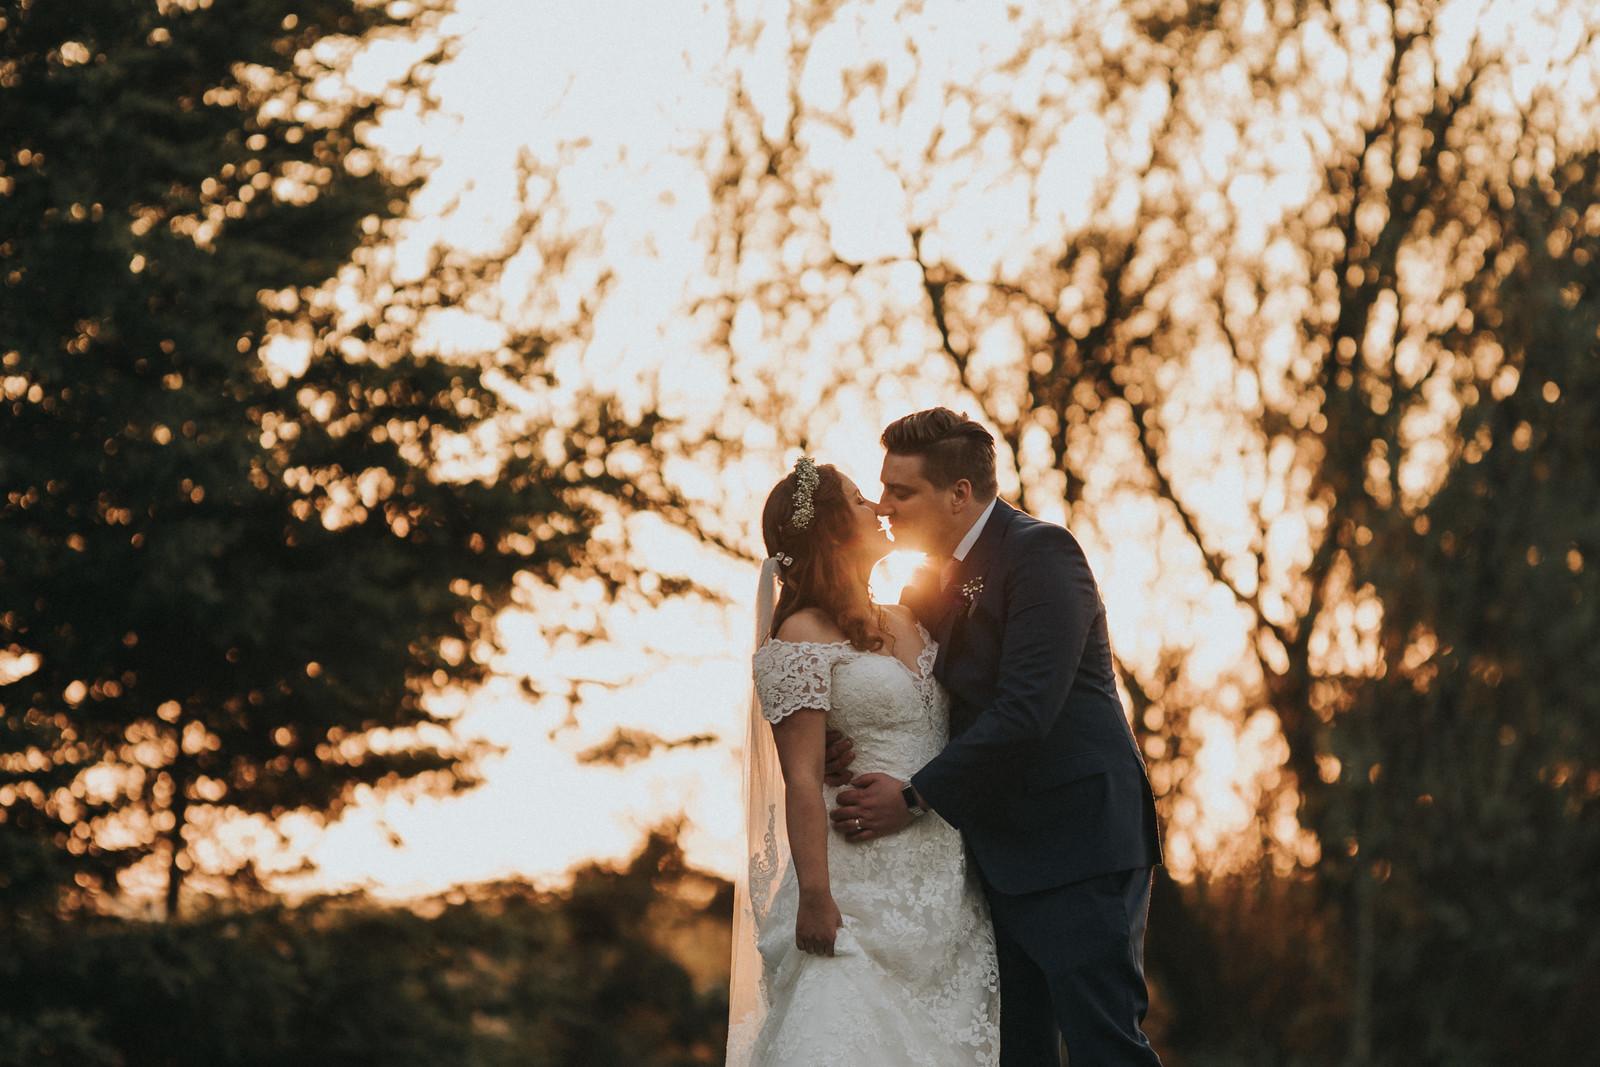 Bride and groom sunset wedding photo - wedding photography Northumberland